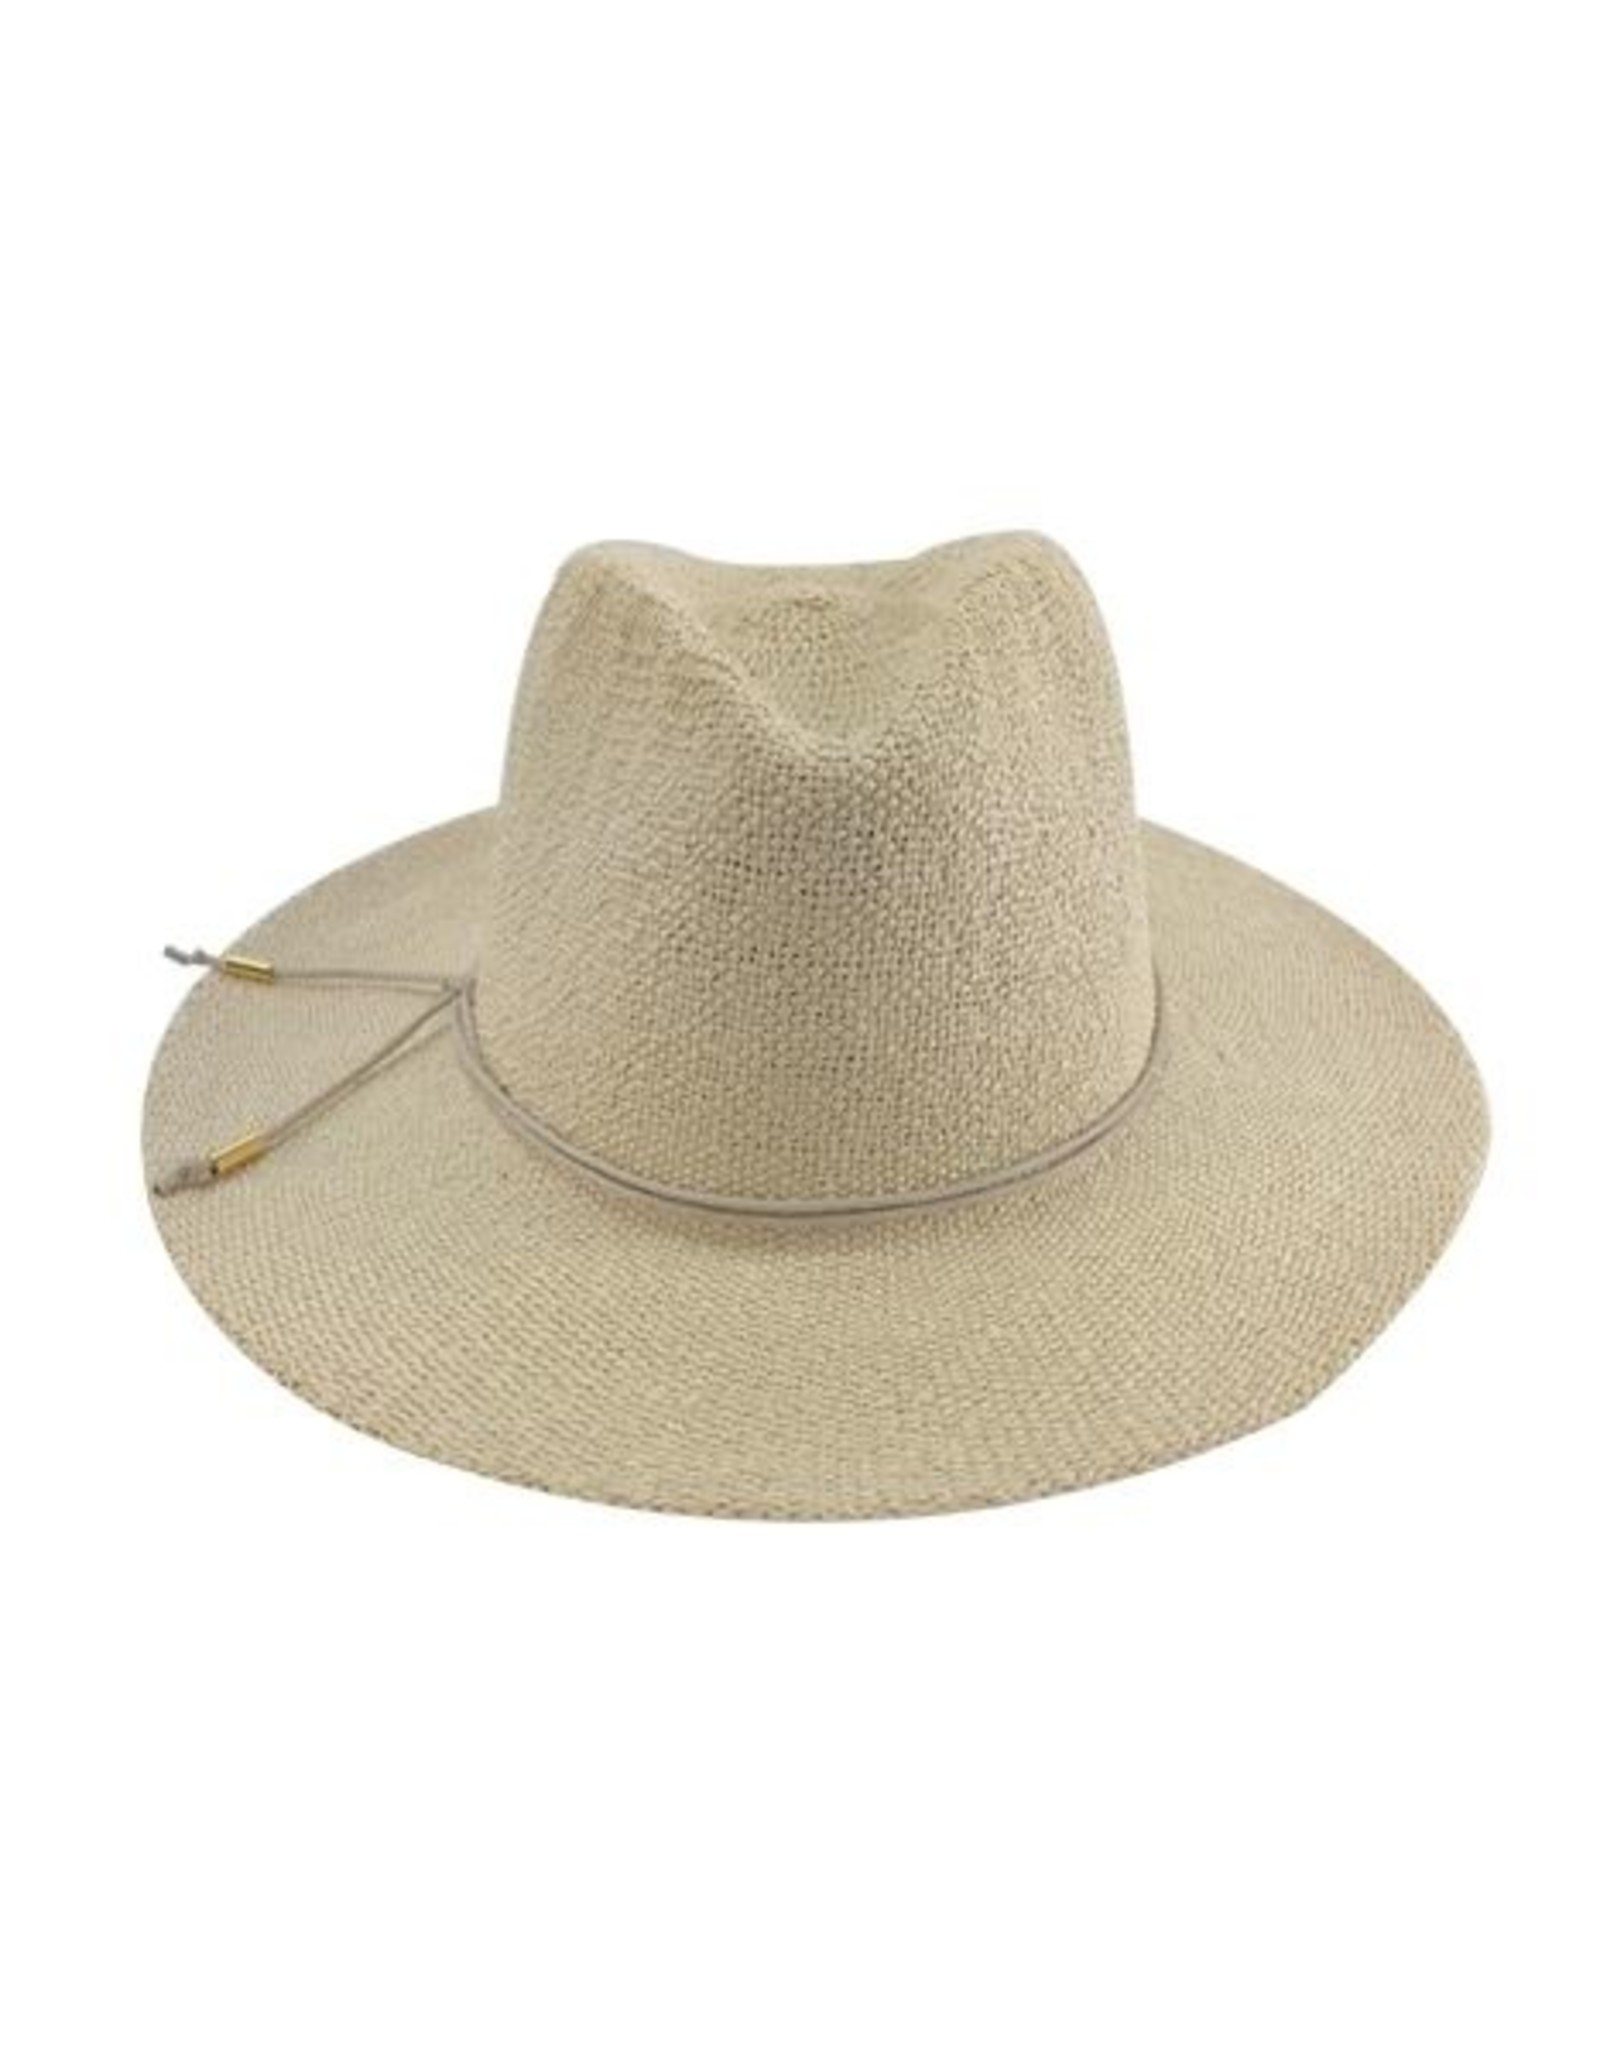 Womens Hand Knit Paper Straw Panama Hat